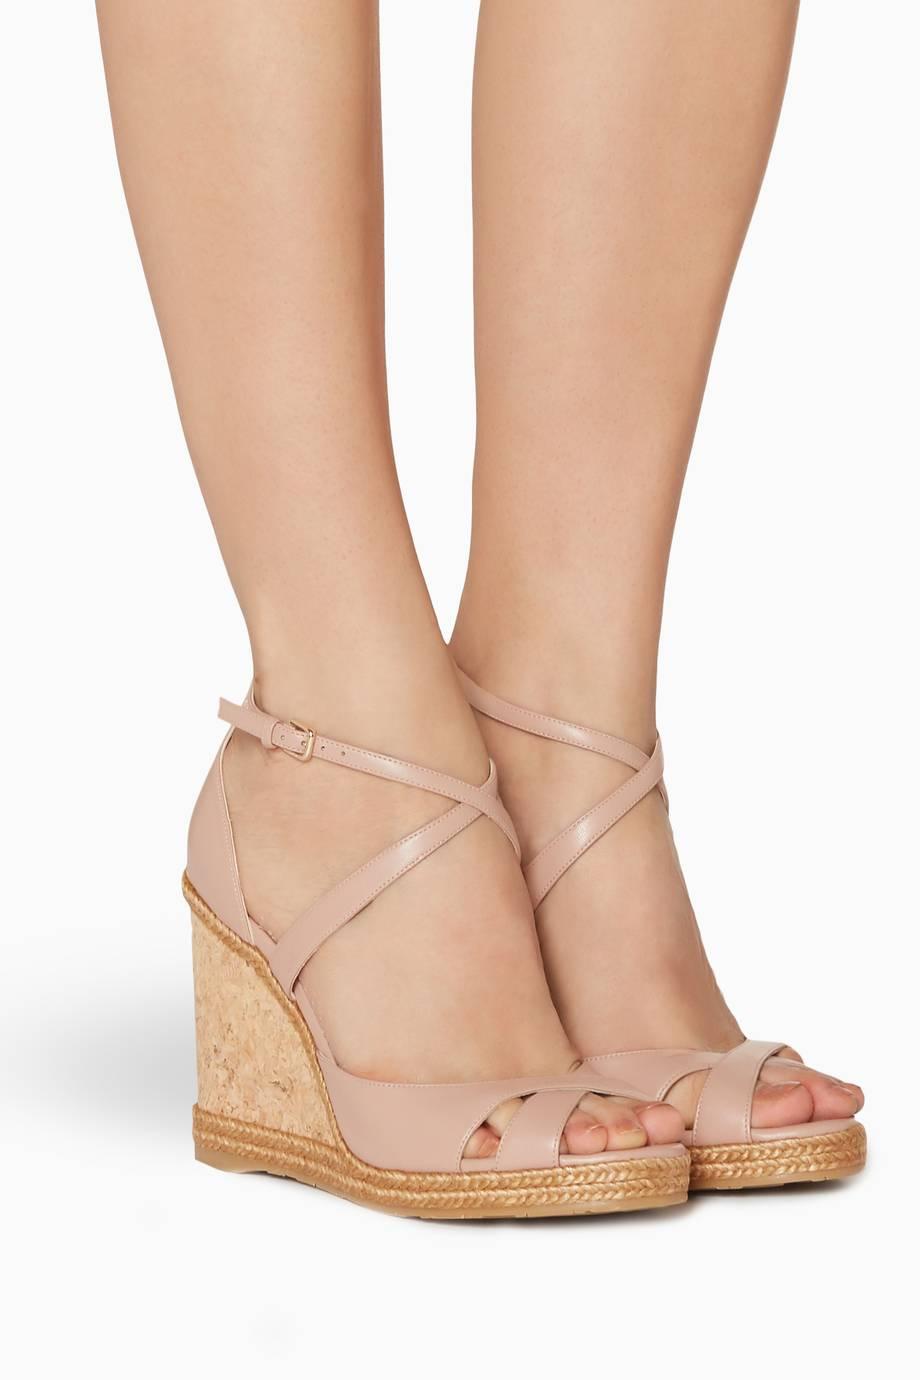 8ec4044cd08b Shop Luxury Jimmy Choo Ballet-Pink Alanah 105 Leather Wedges ...